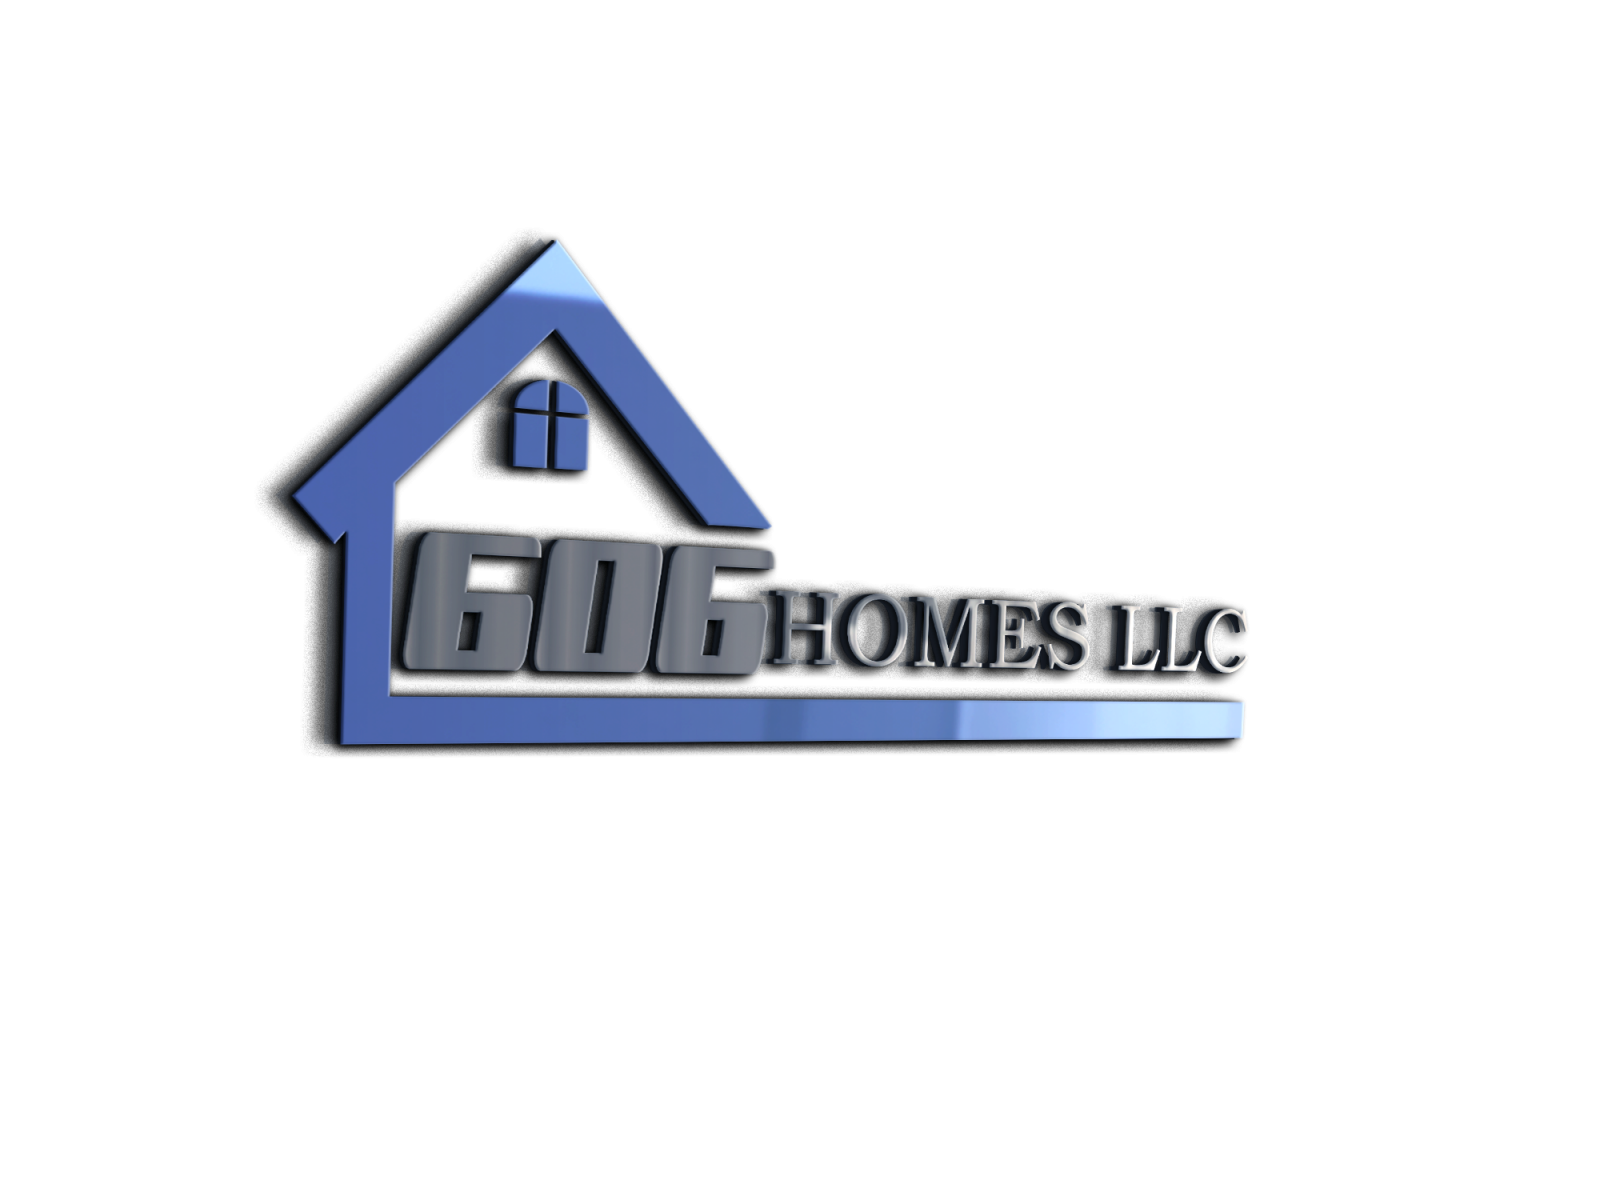 606 HOMES LLC logo